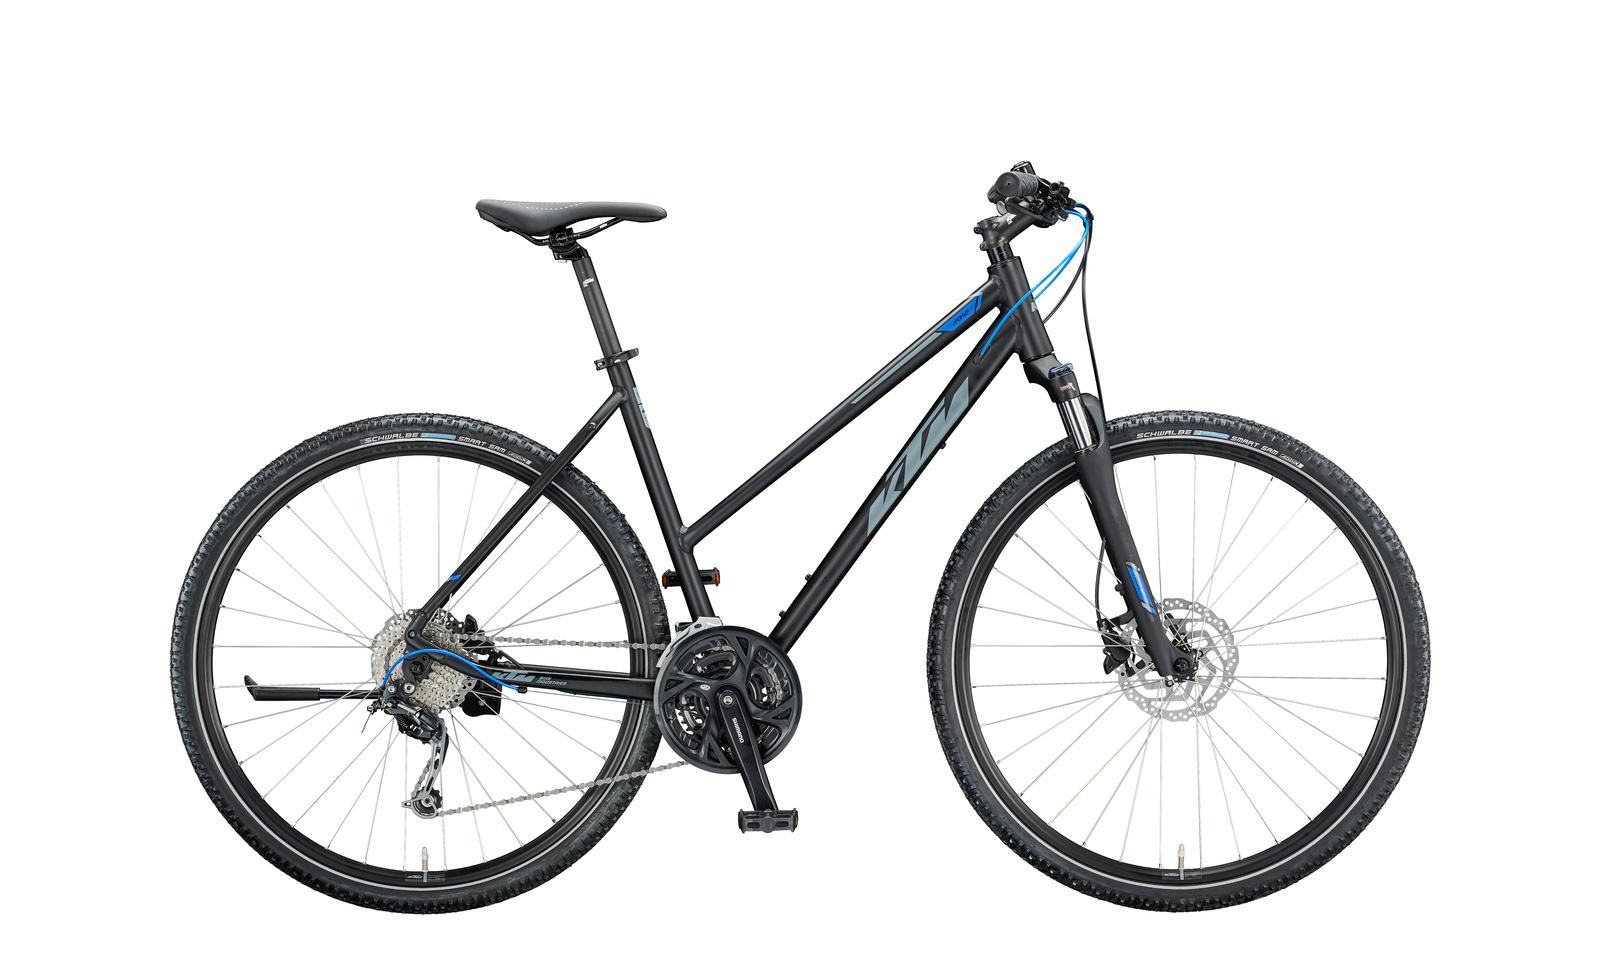 Biciclete KTM Trekking Offroad LIFE ROAD 3x9 Shimano Deore